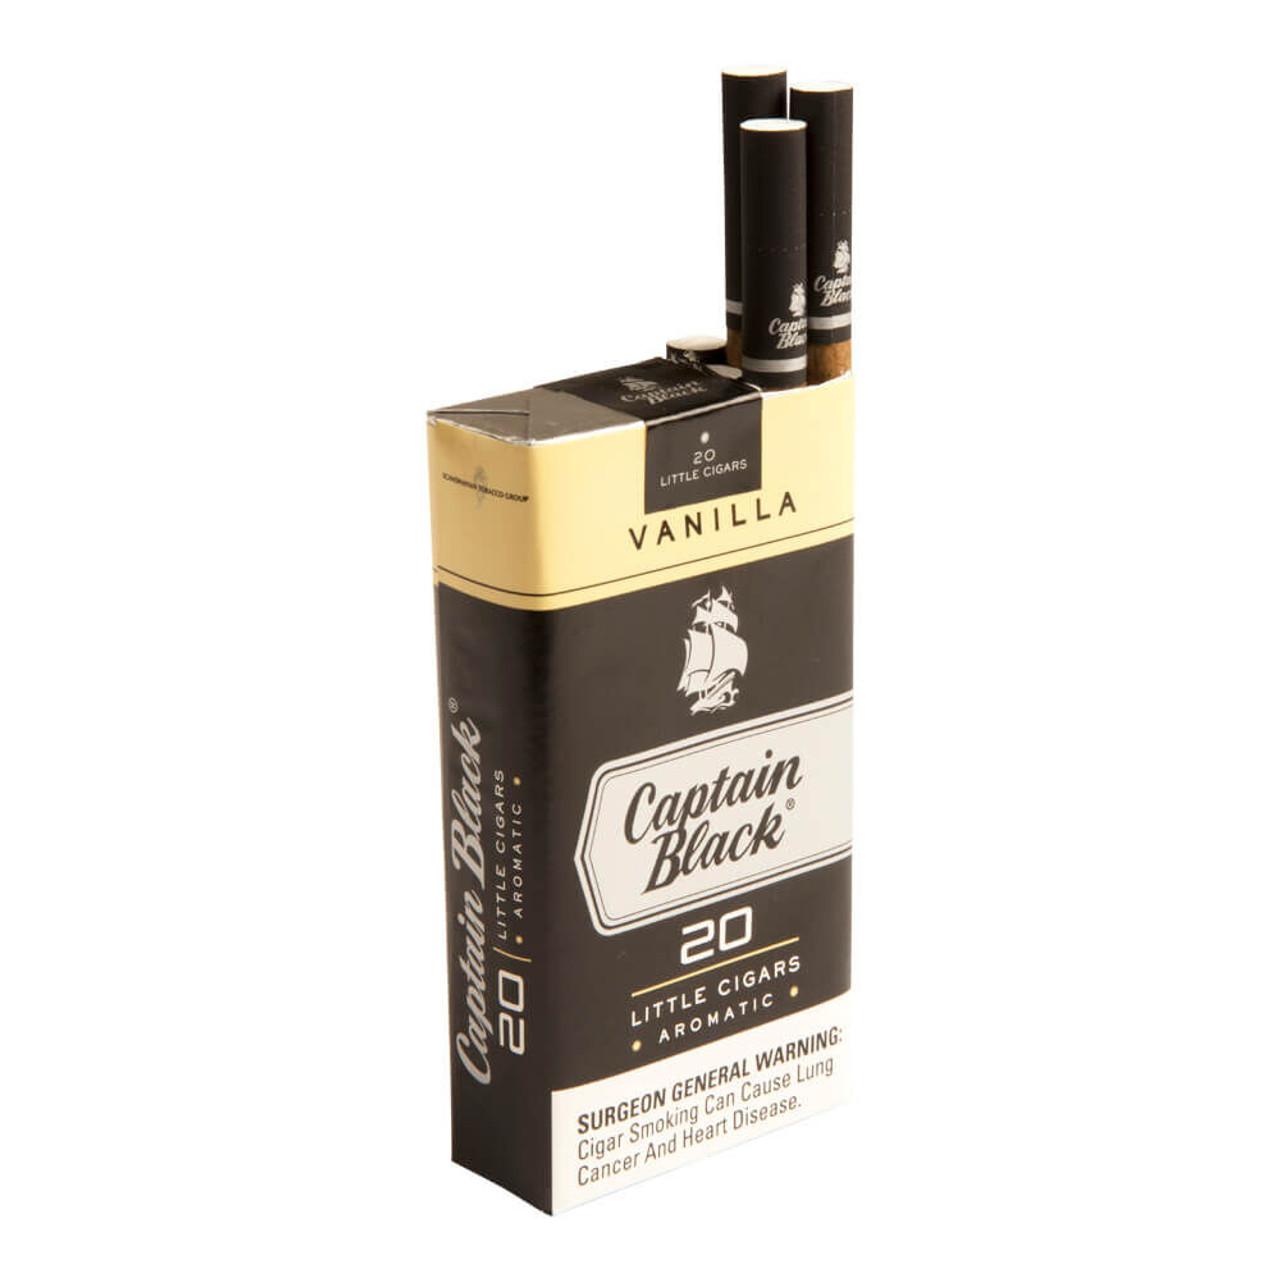 Captain Black Little Cigars Vanilla Cigars - 3.75 x 20 (10 Packs of 20 (200 total))